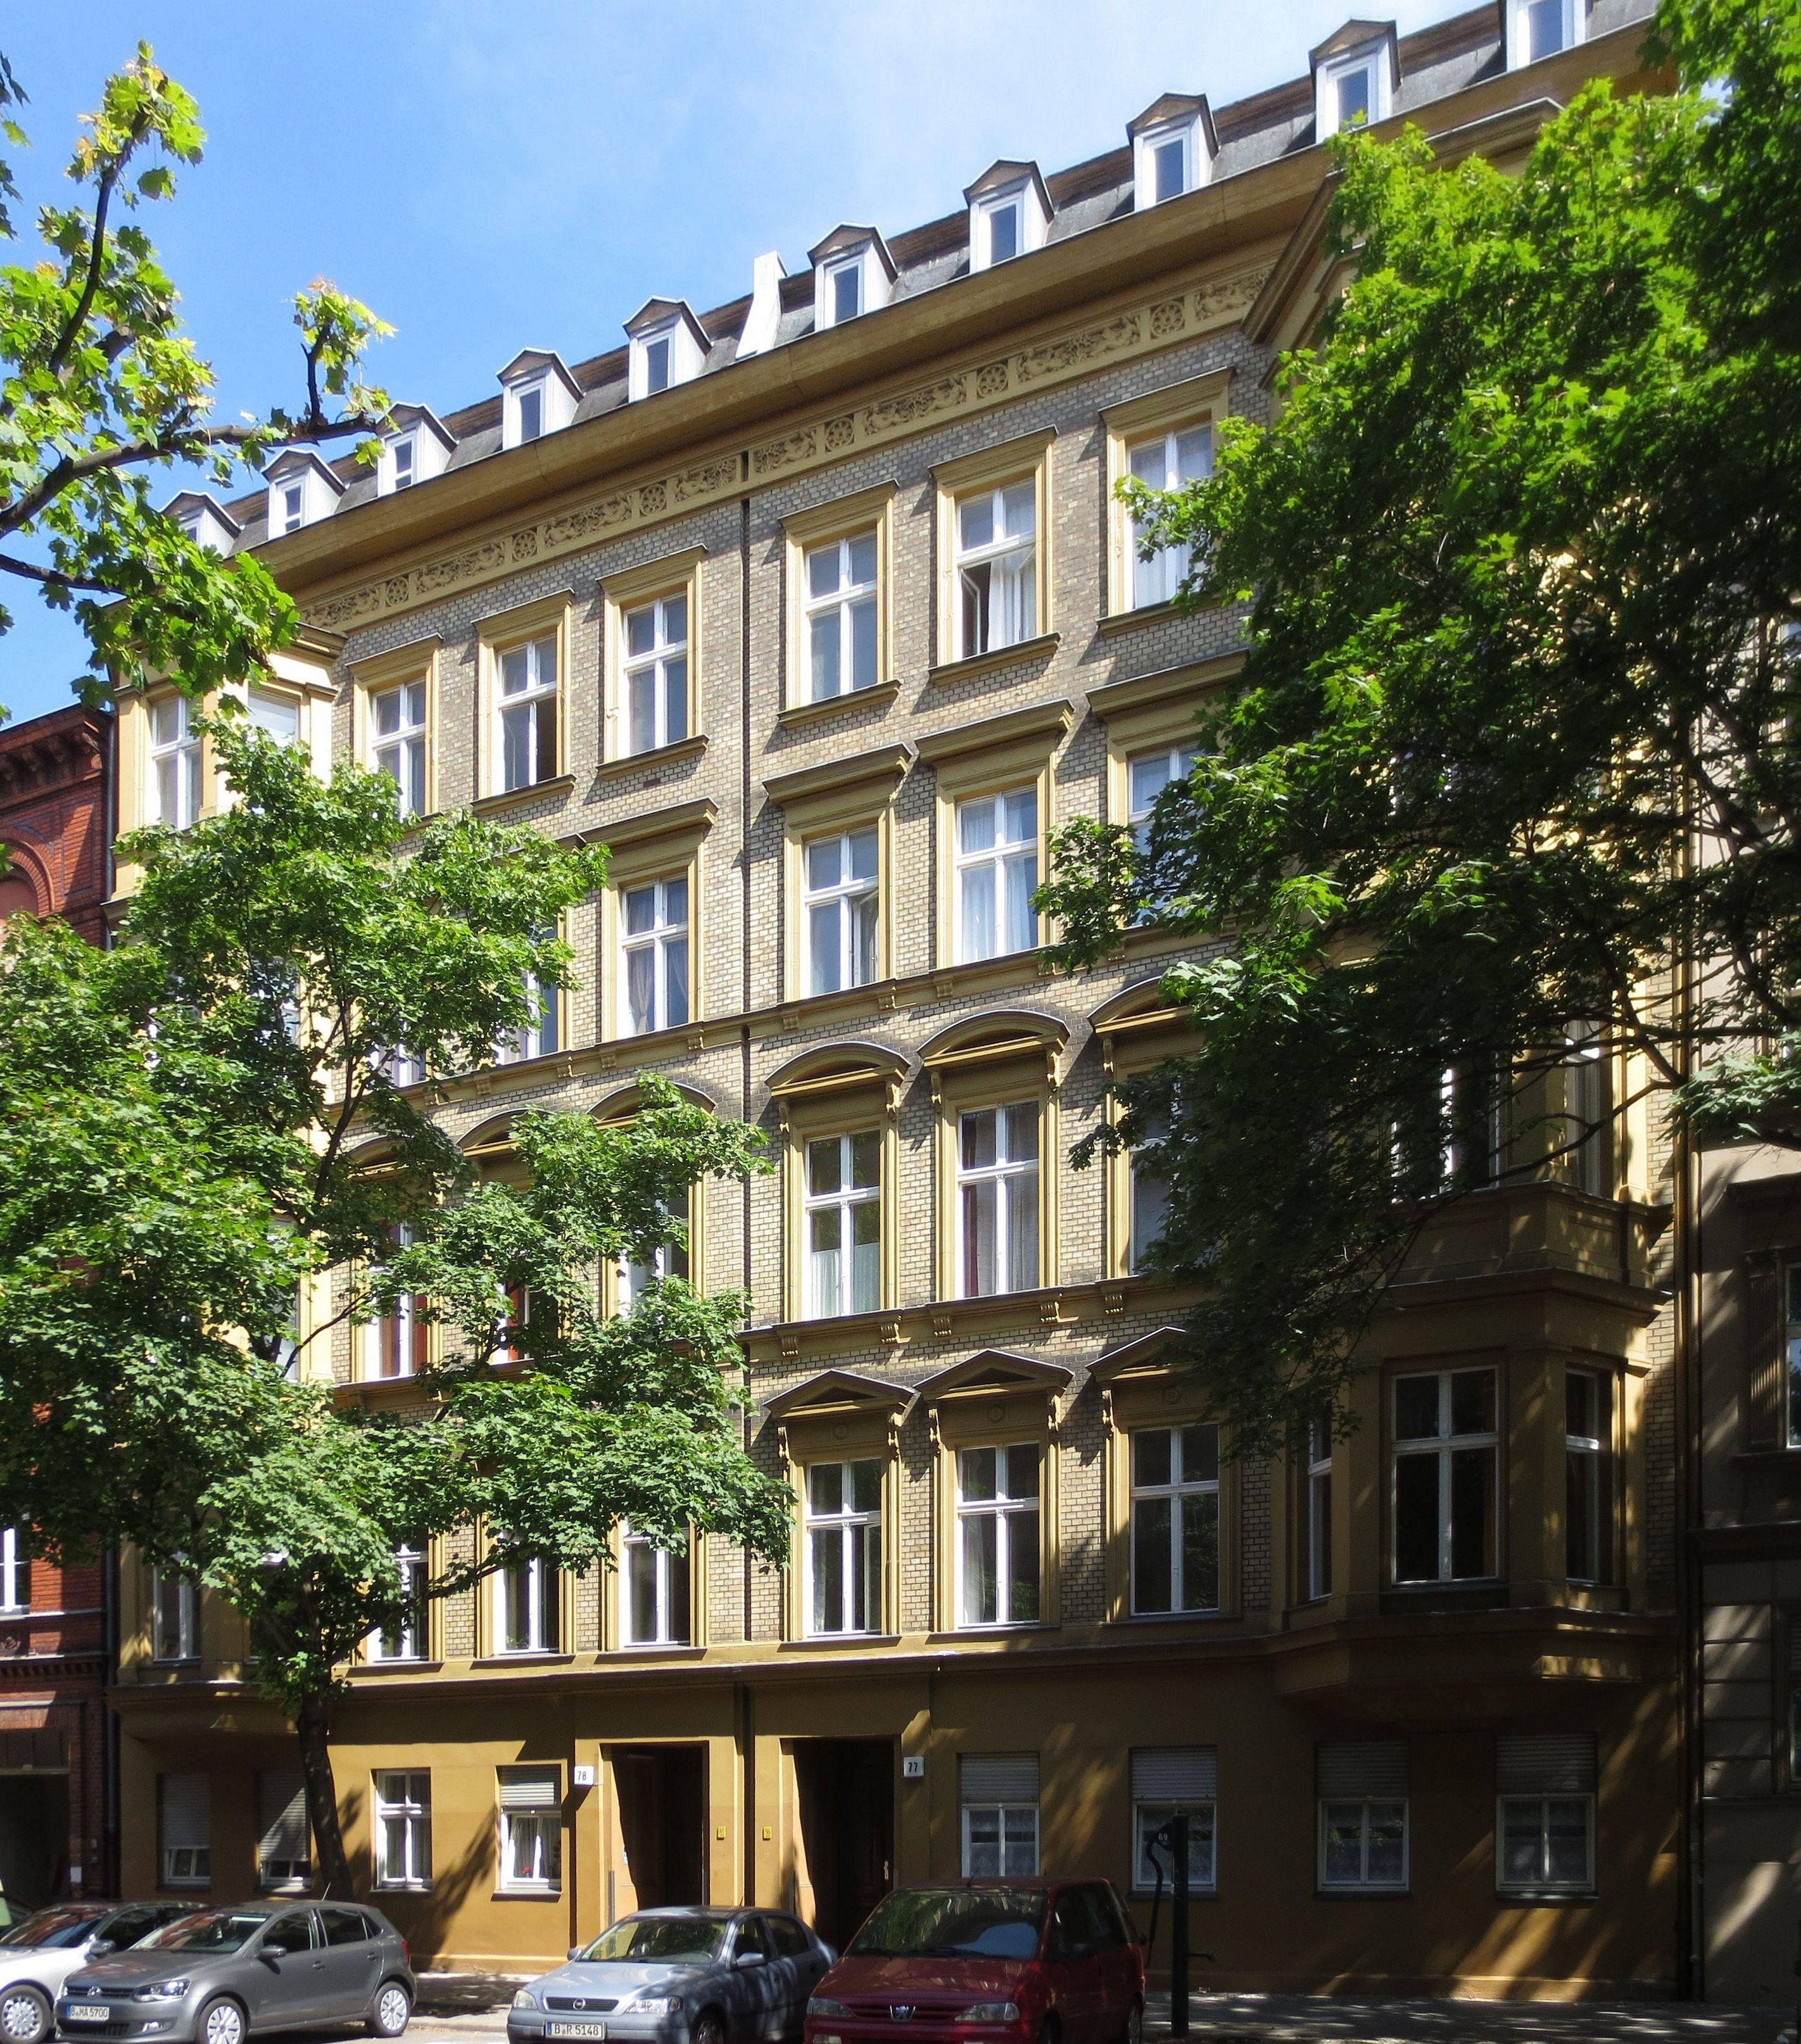 file berlin schoeneberg steinmetzstrasse 77 78 wikimedia commons. Black Bedroom Furniture Sets. Home Design Ideas